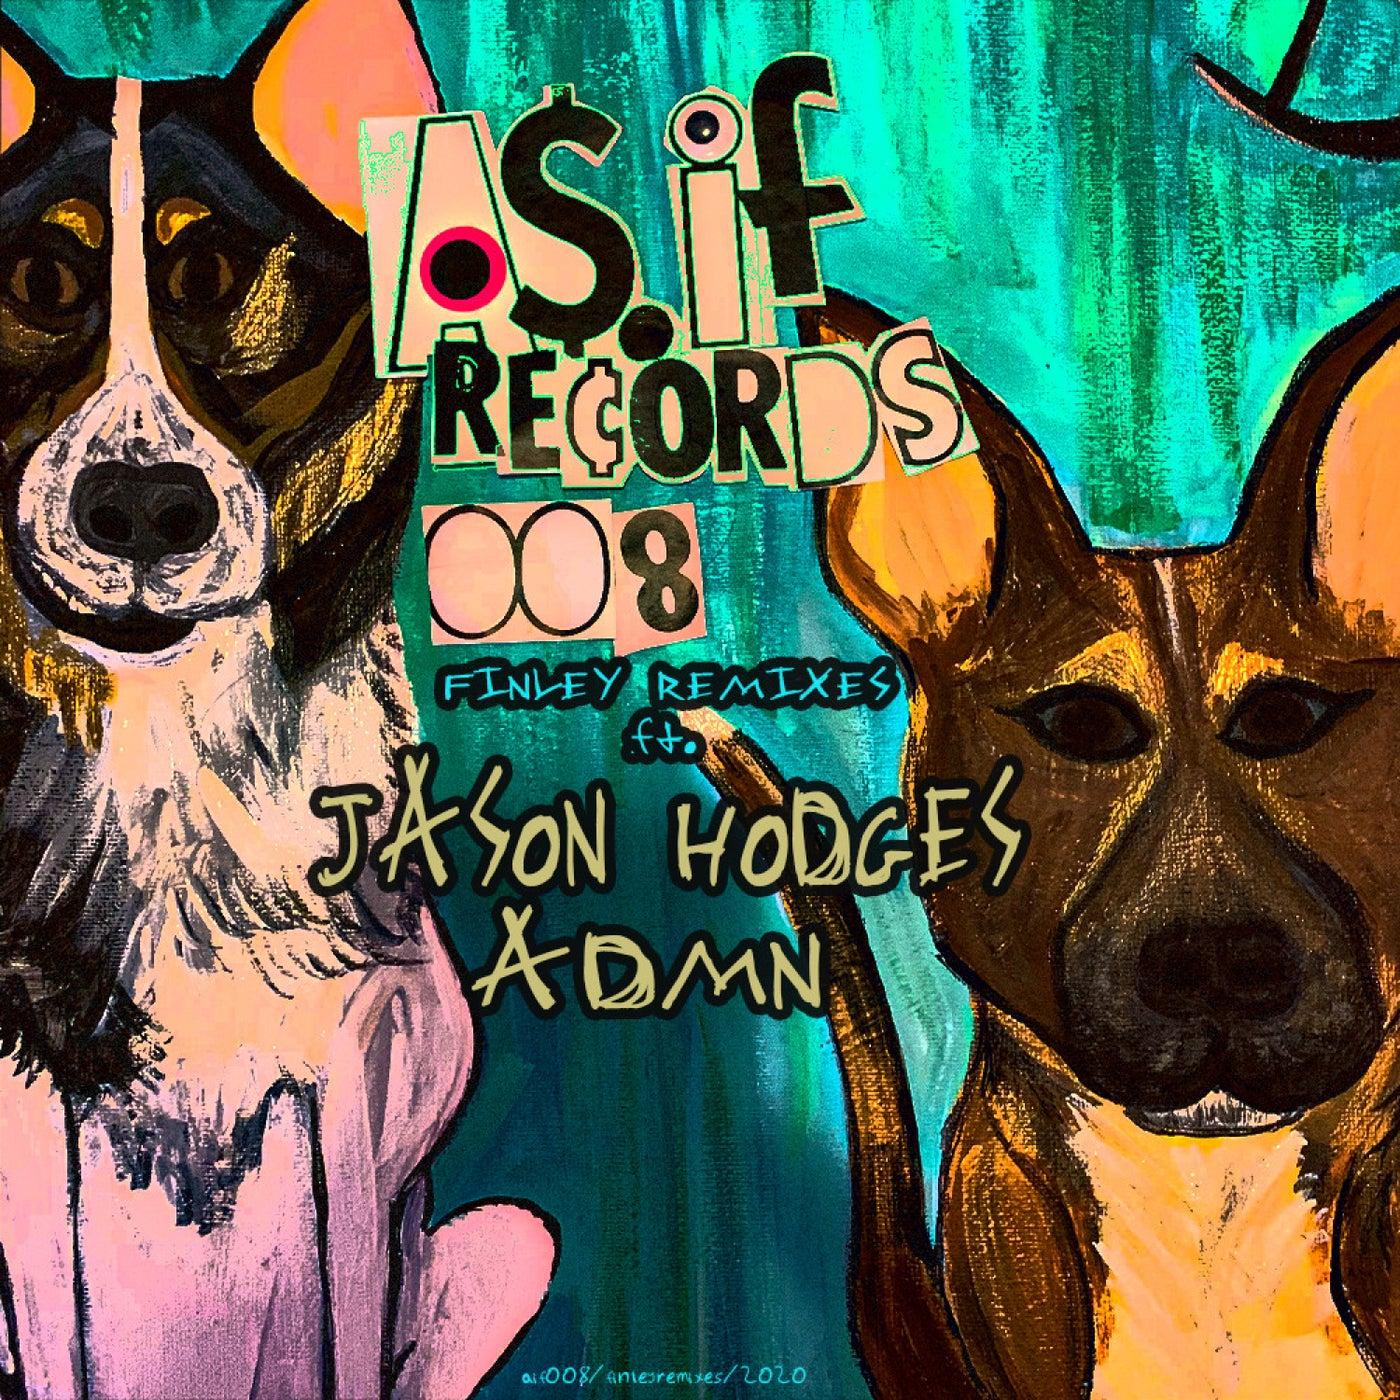 OH B! (Jason Hodges Remix)